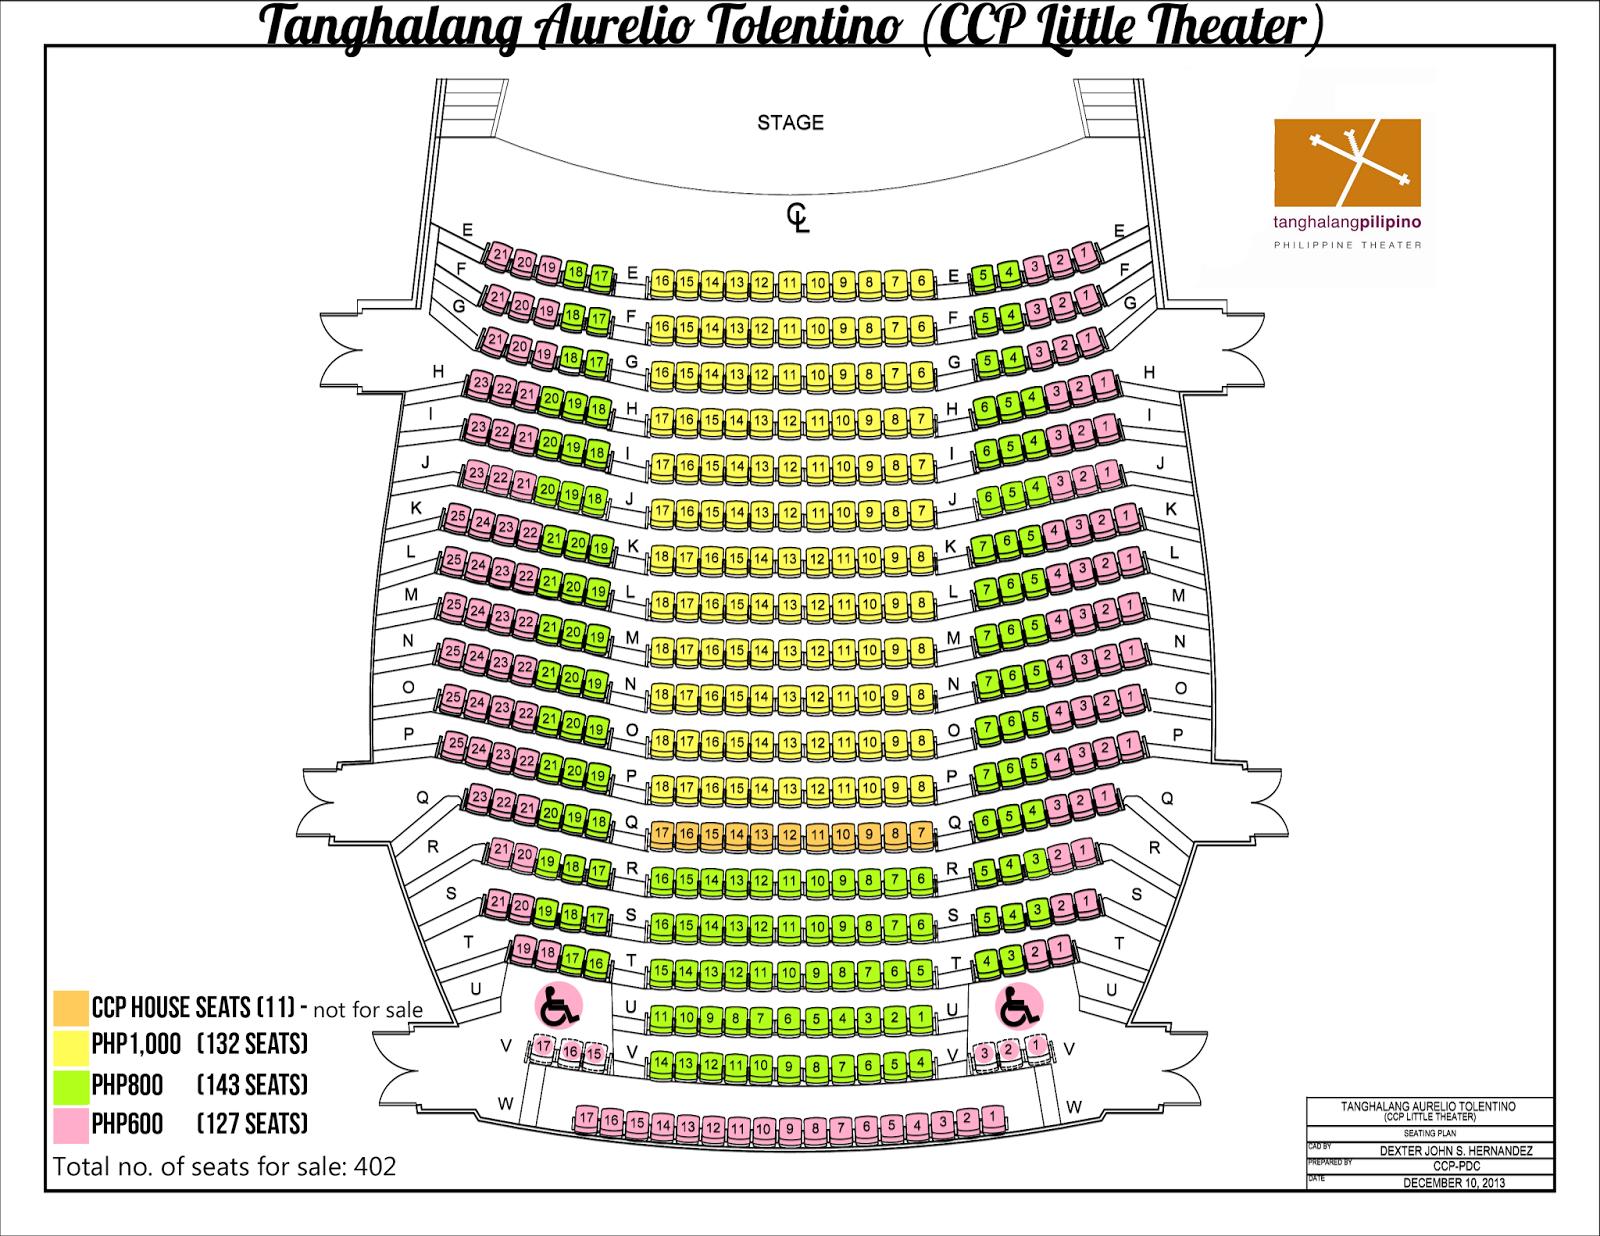 Tanghalang pilipino 28th theater season opener for Ccp flooring